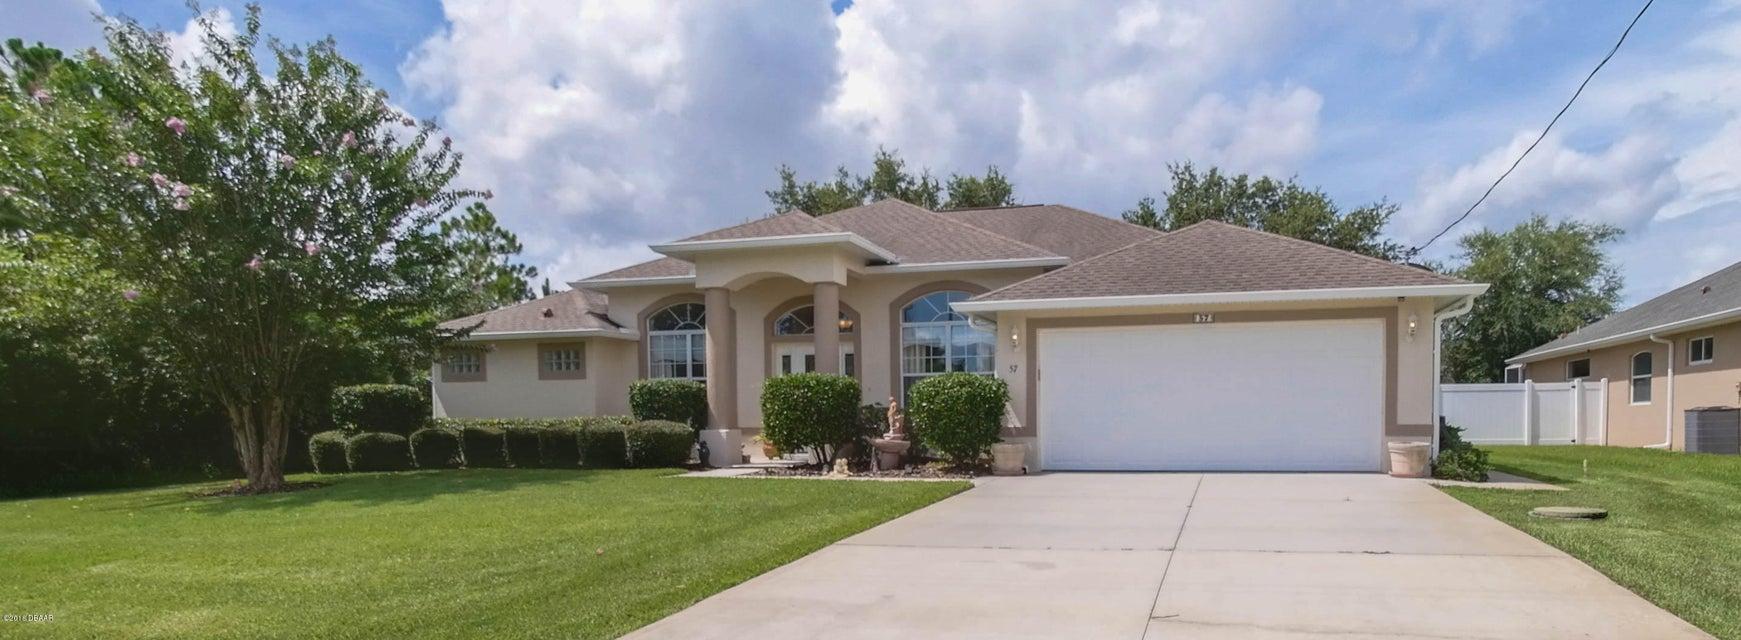 Photo of 57 Butterfield Drive, Palm Coast, FL 32137